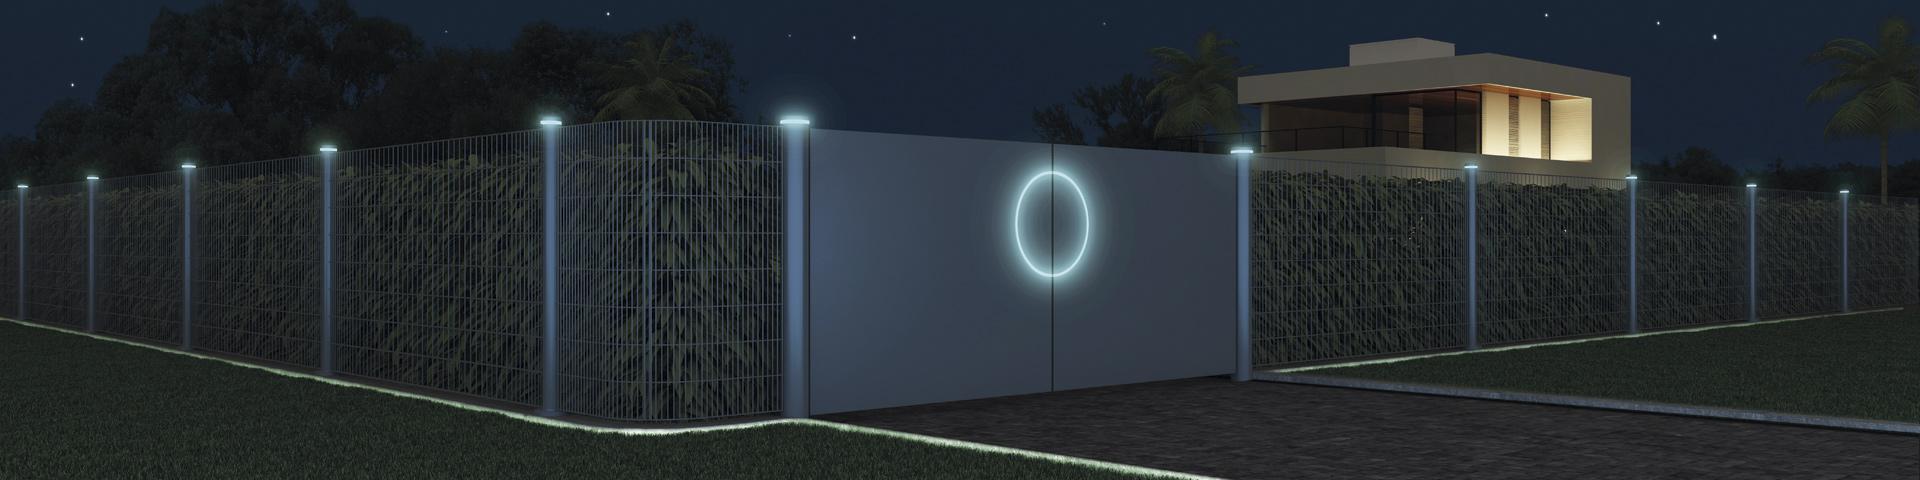 nightview-otype